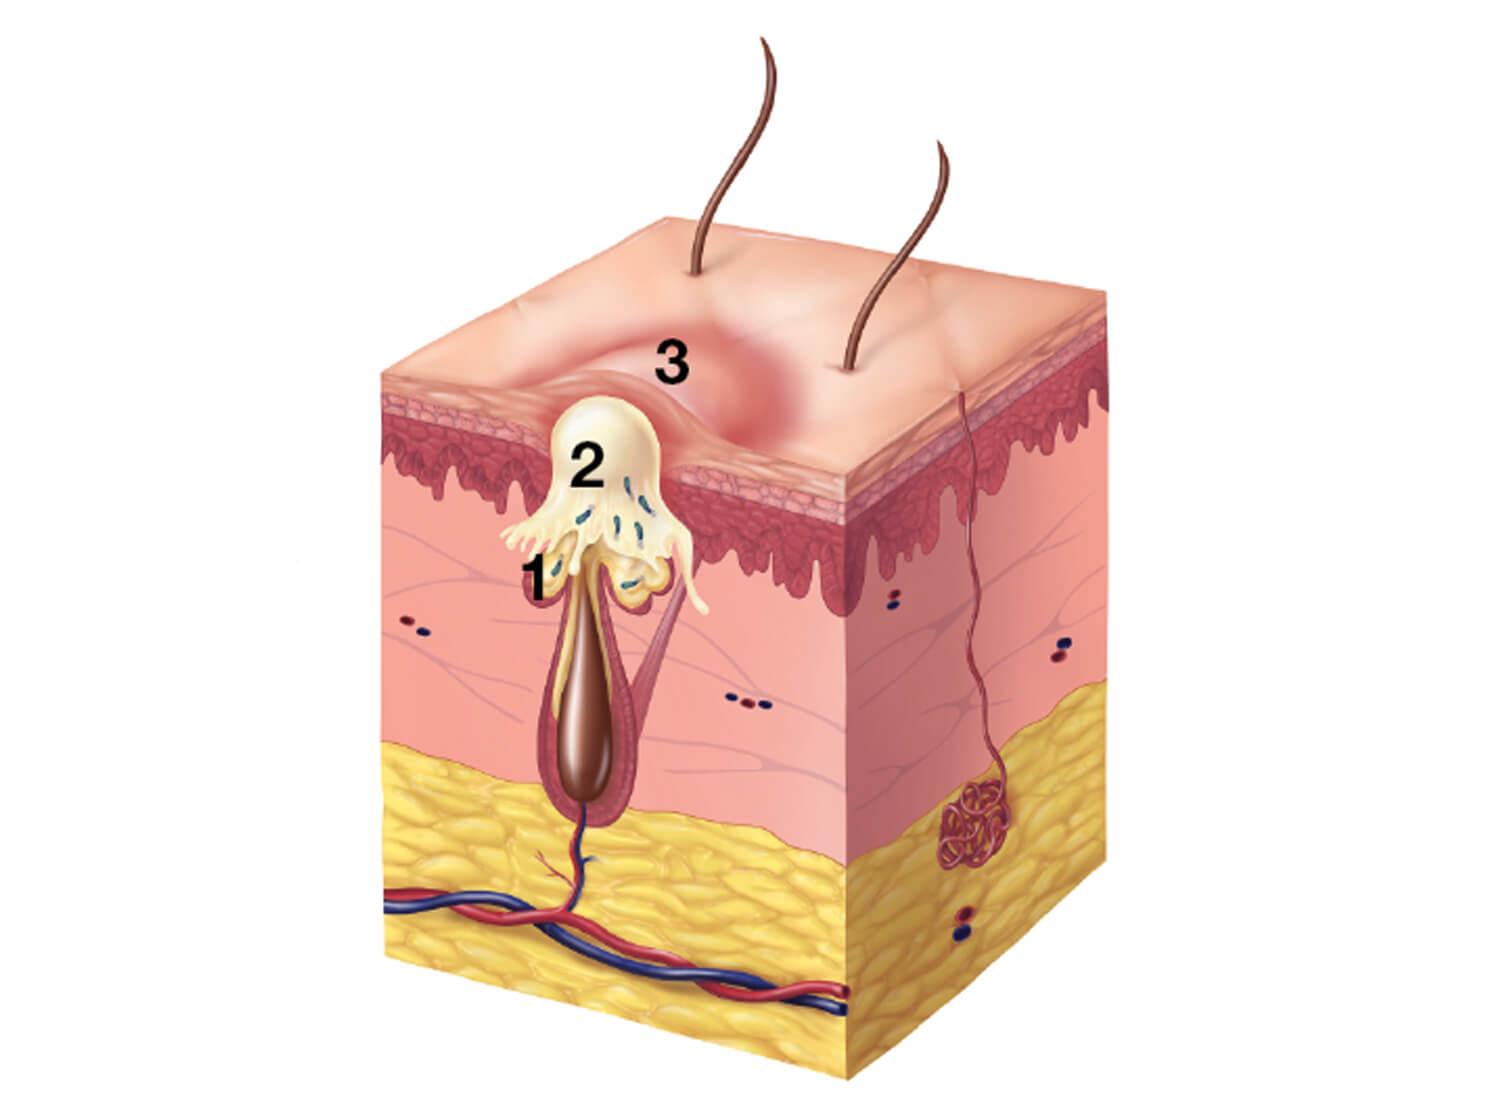 Illustration of a papule